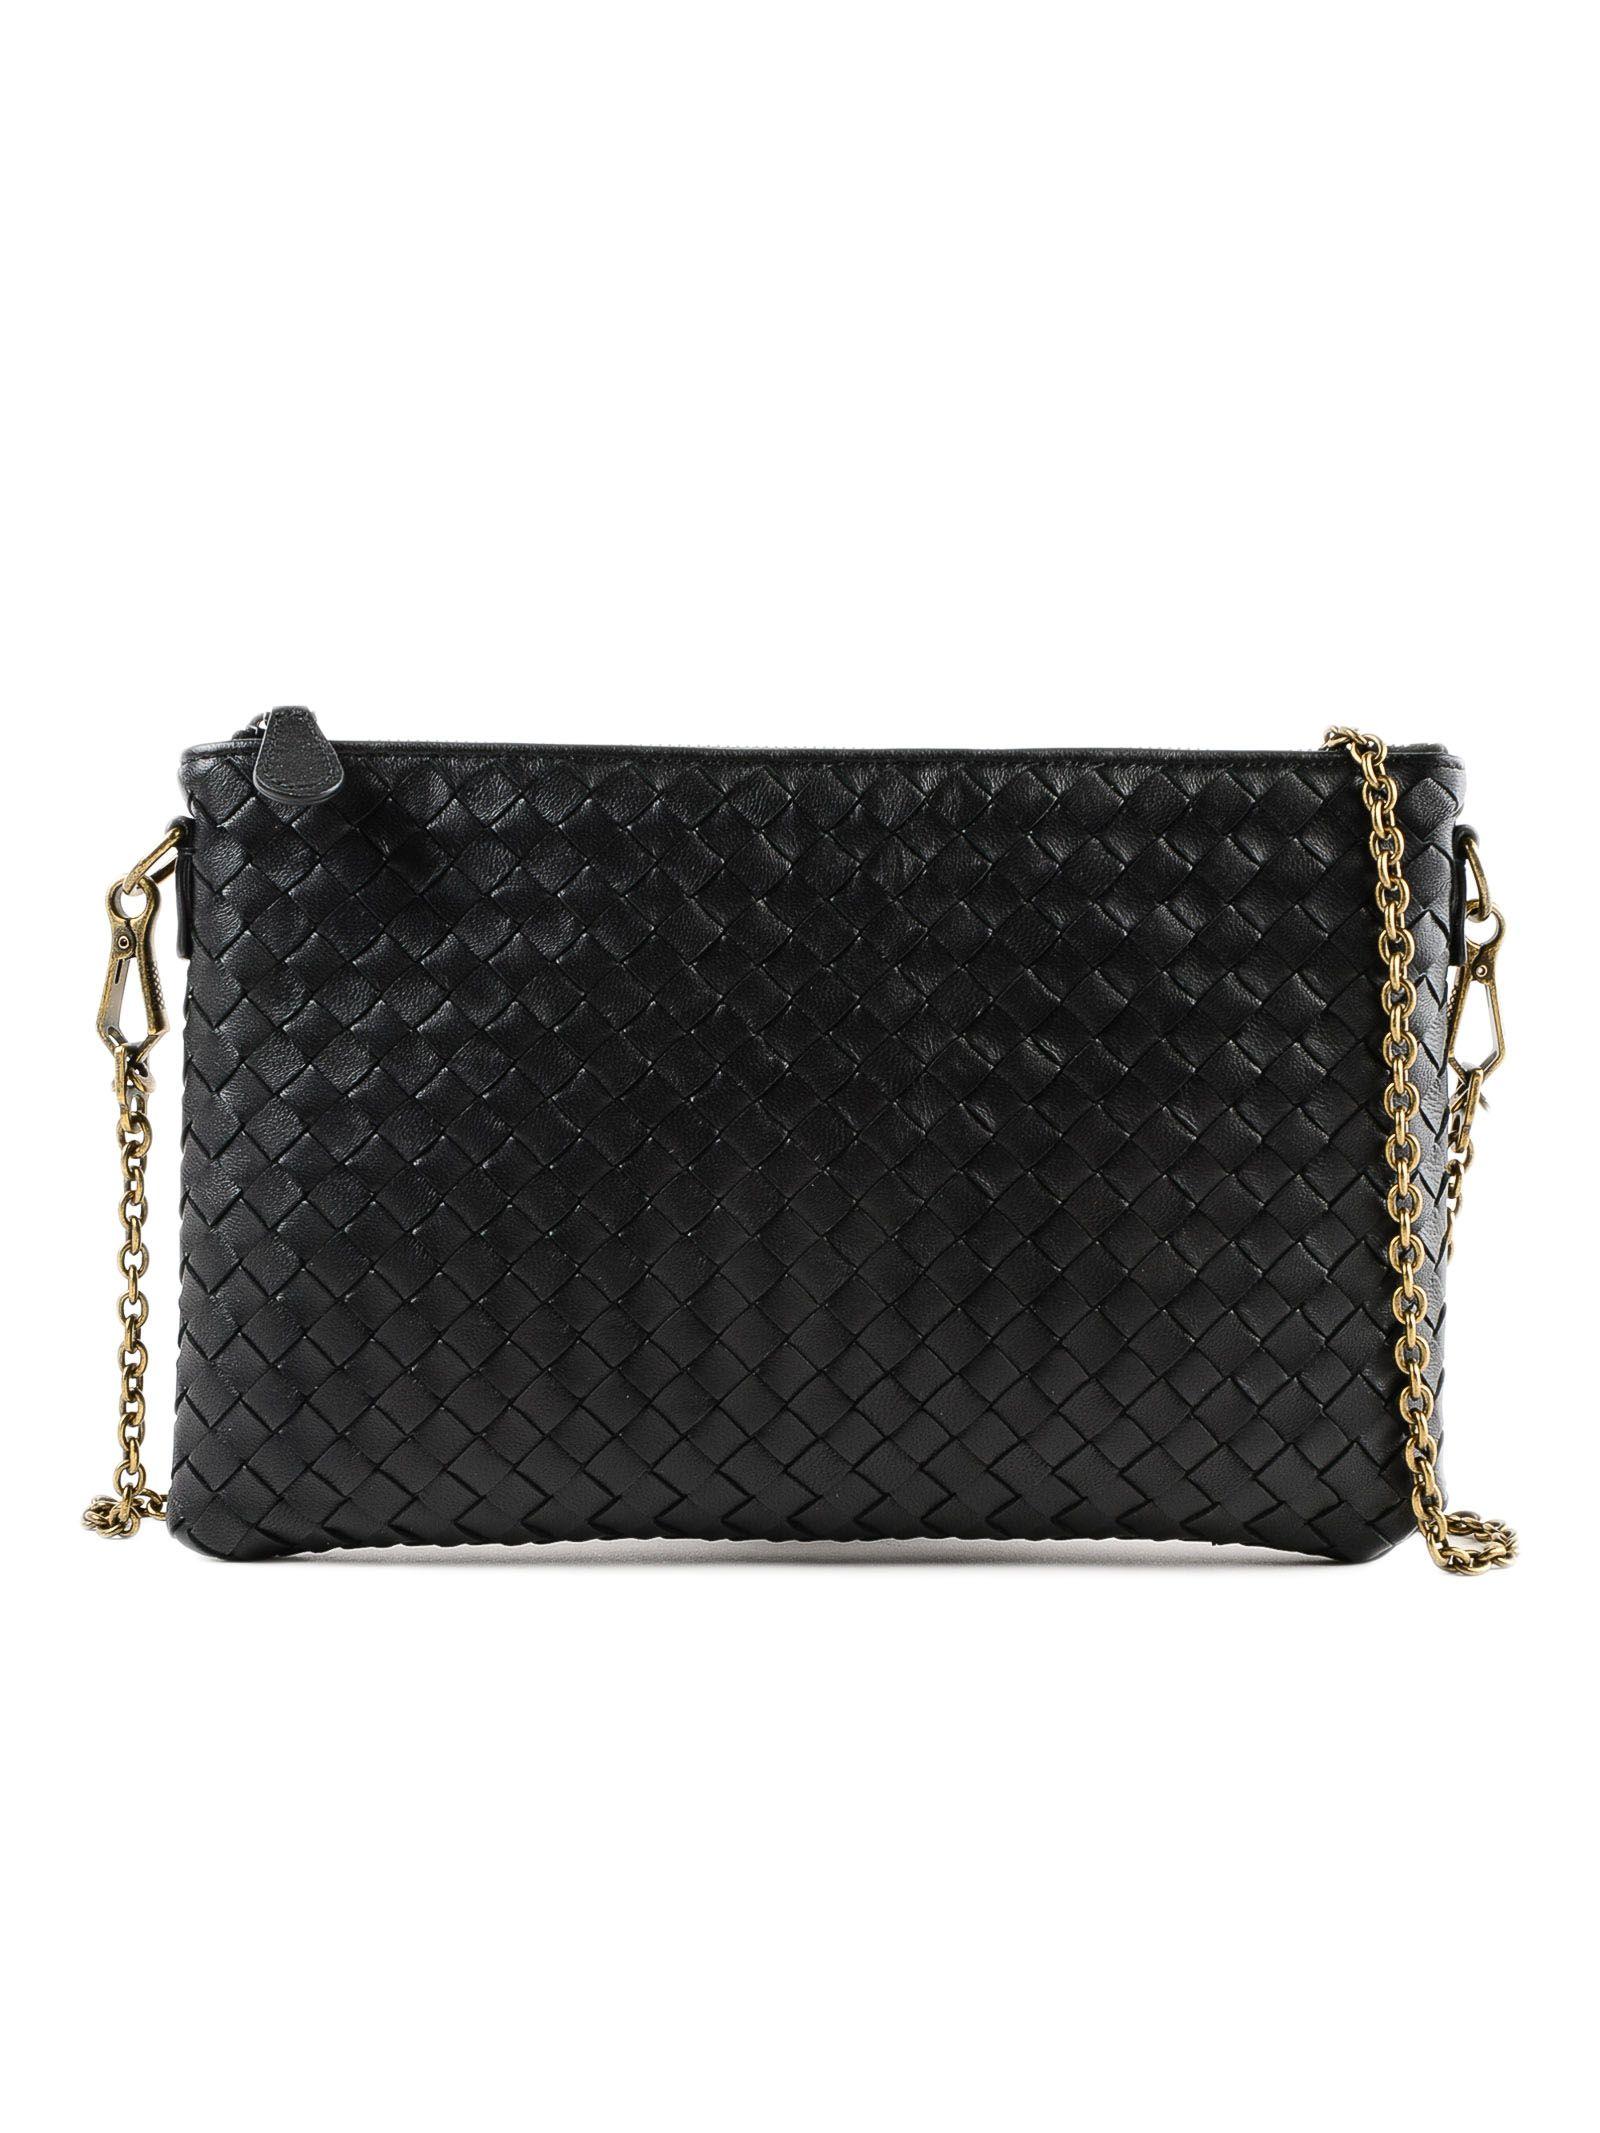 Bottega Veneta Woven Shoulder Bag